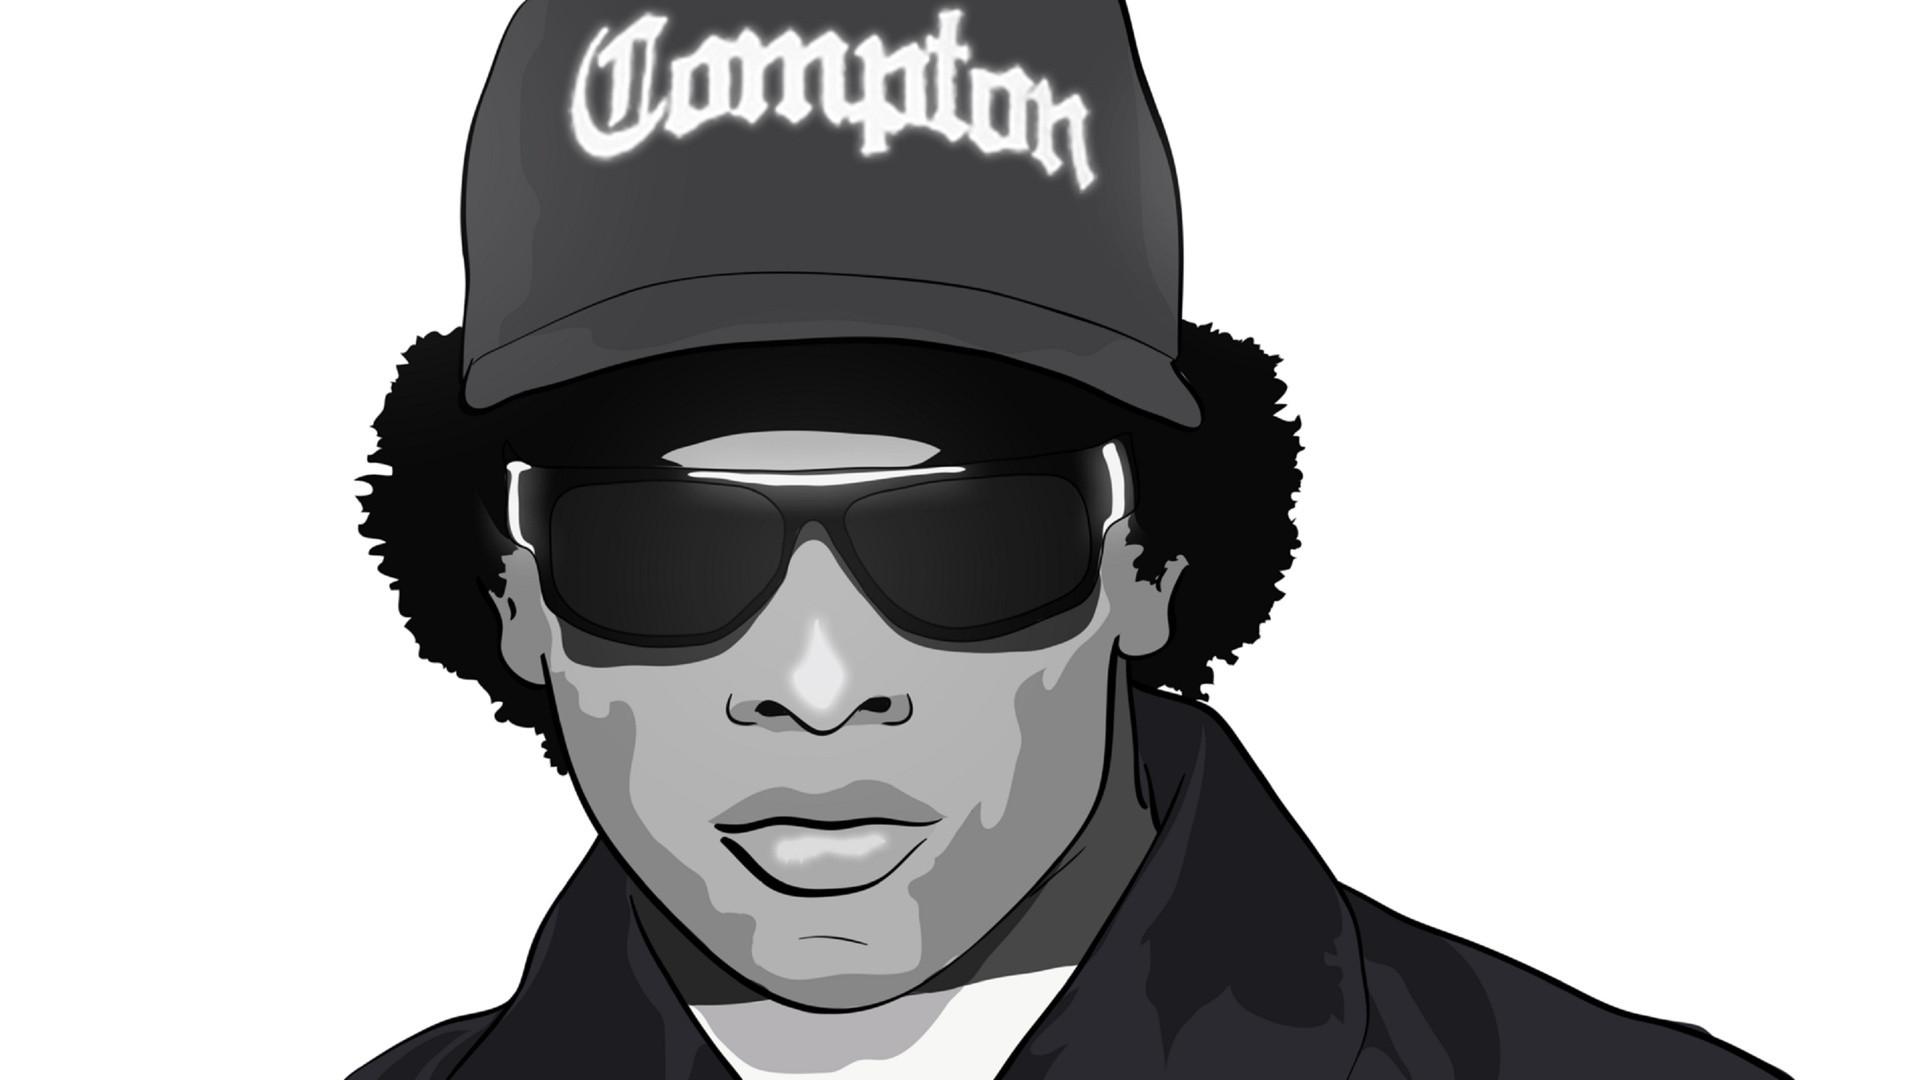 Eazy Enwa, Hip Hop, Rapper, Nwa, Rap, Singer, Eazy Enwa